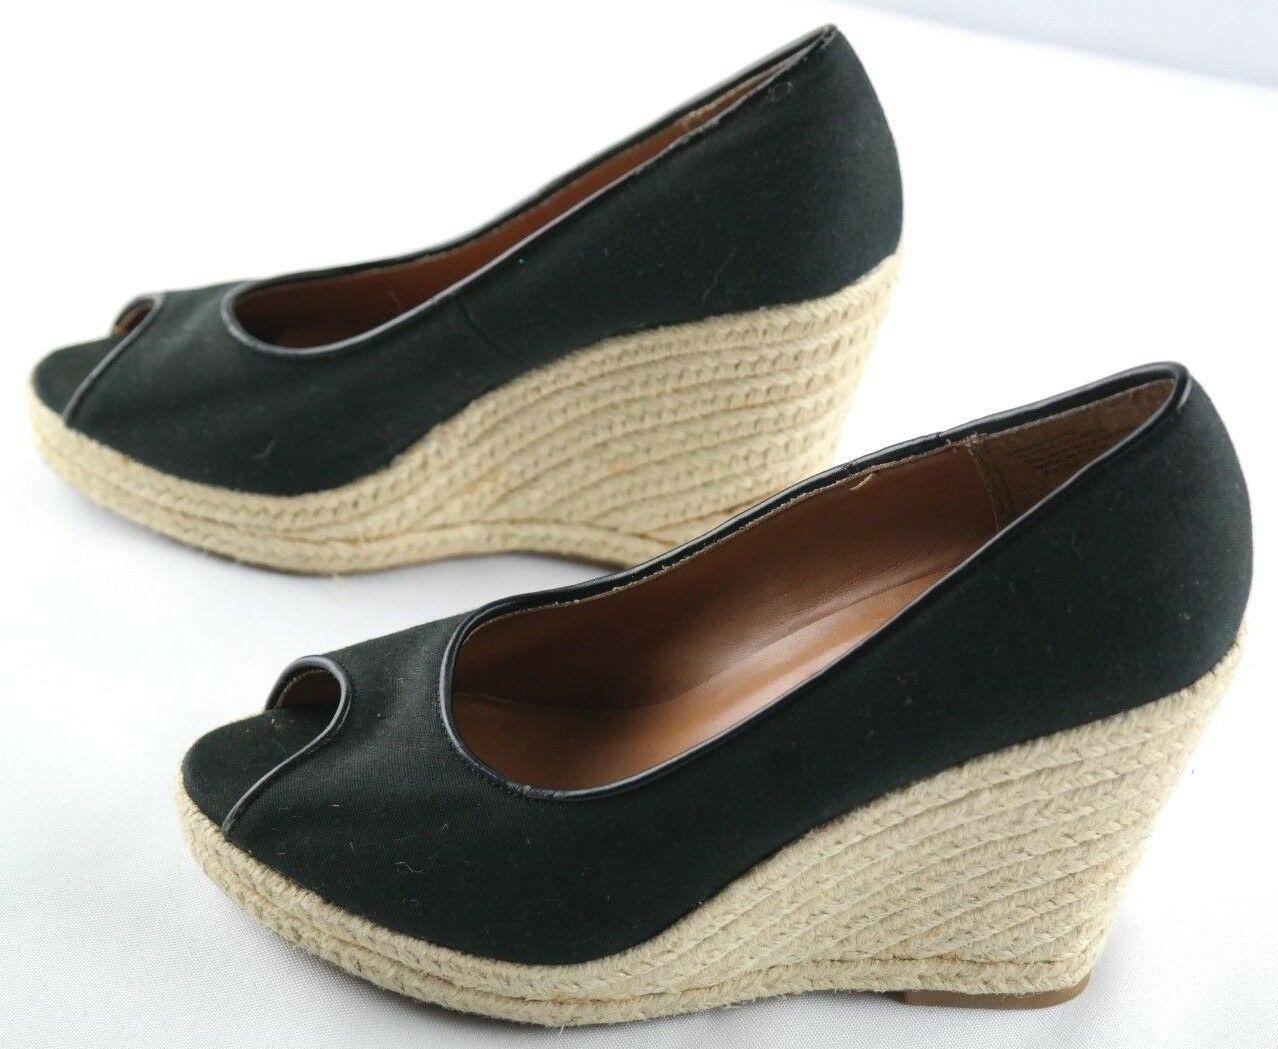 Steve Madden Peep Wedges Womens Size 6 Black Canvas Slip On High Heel Shoes image 4